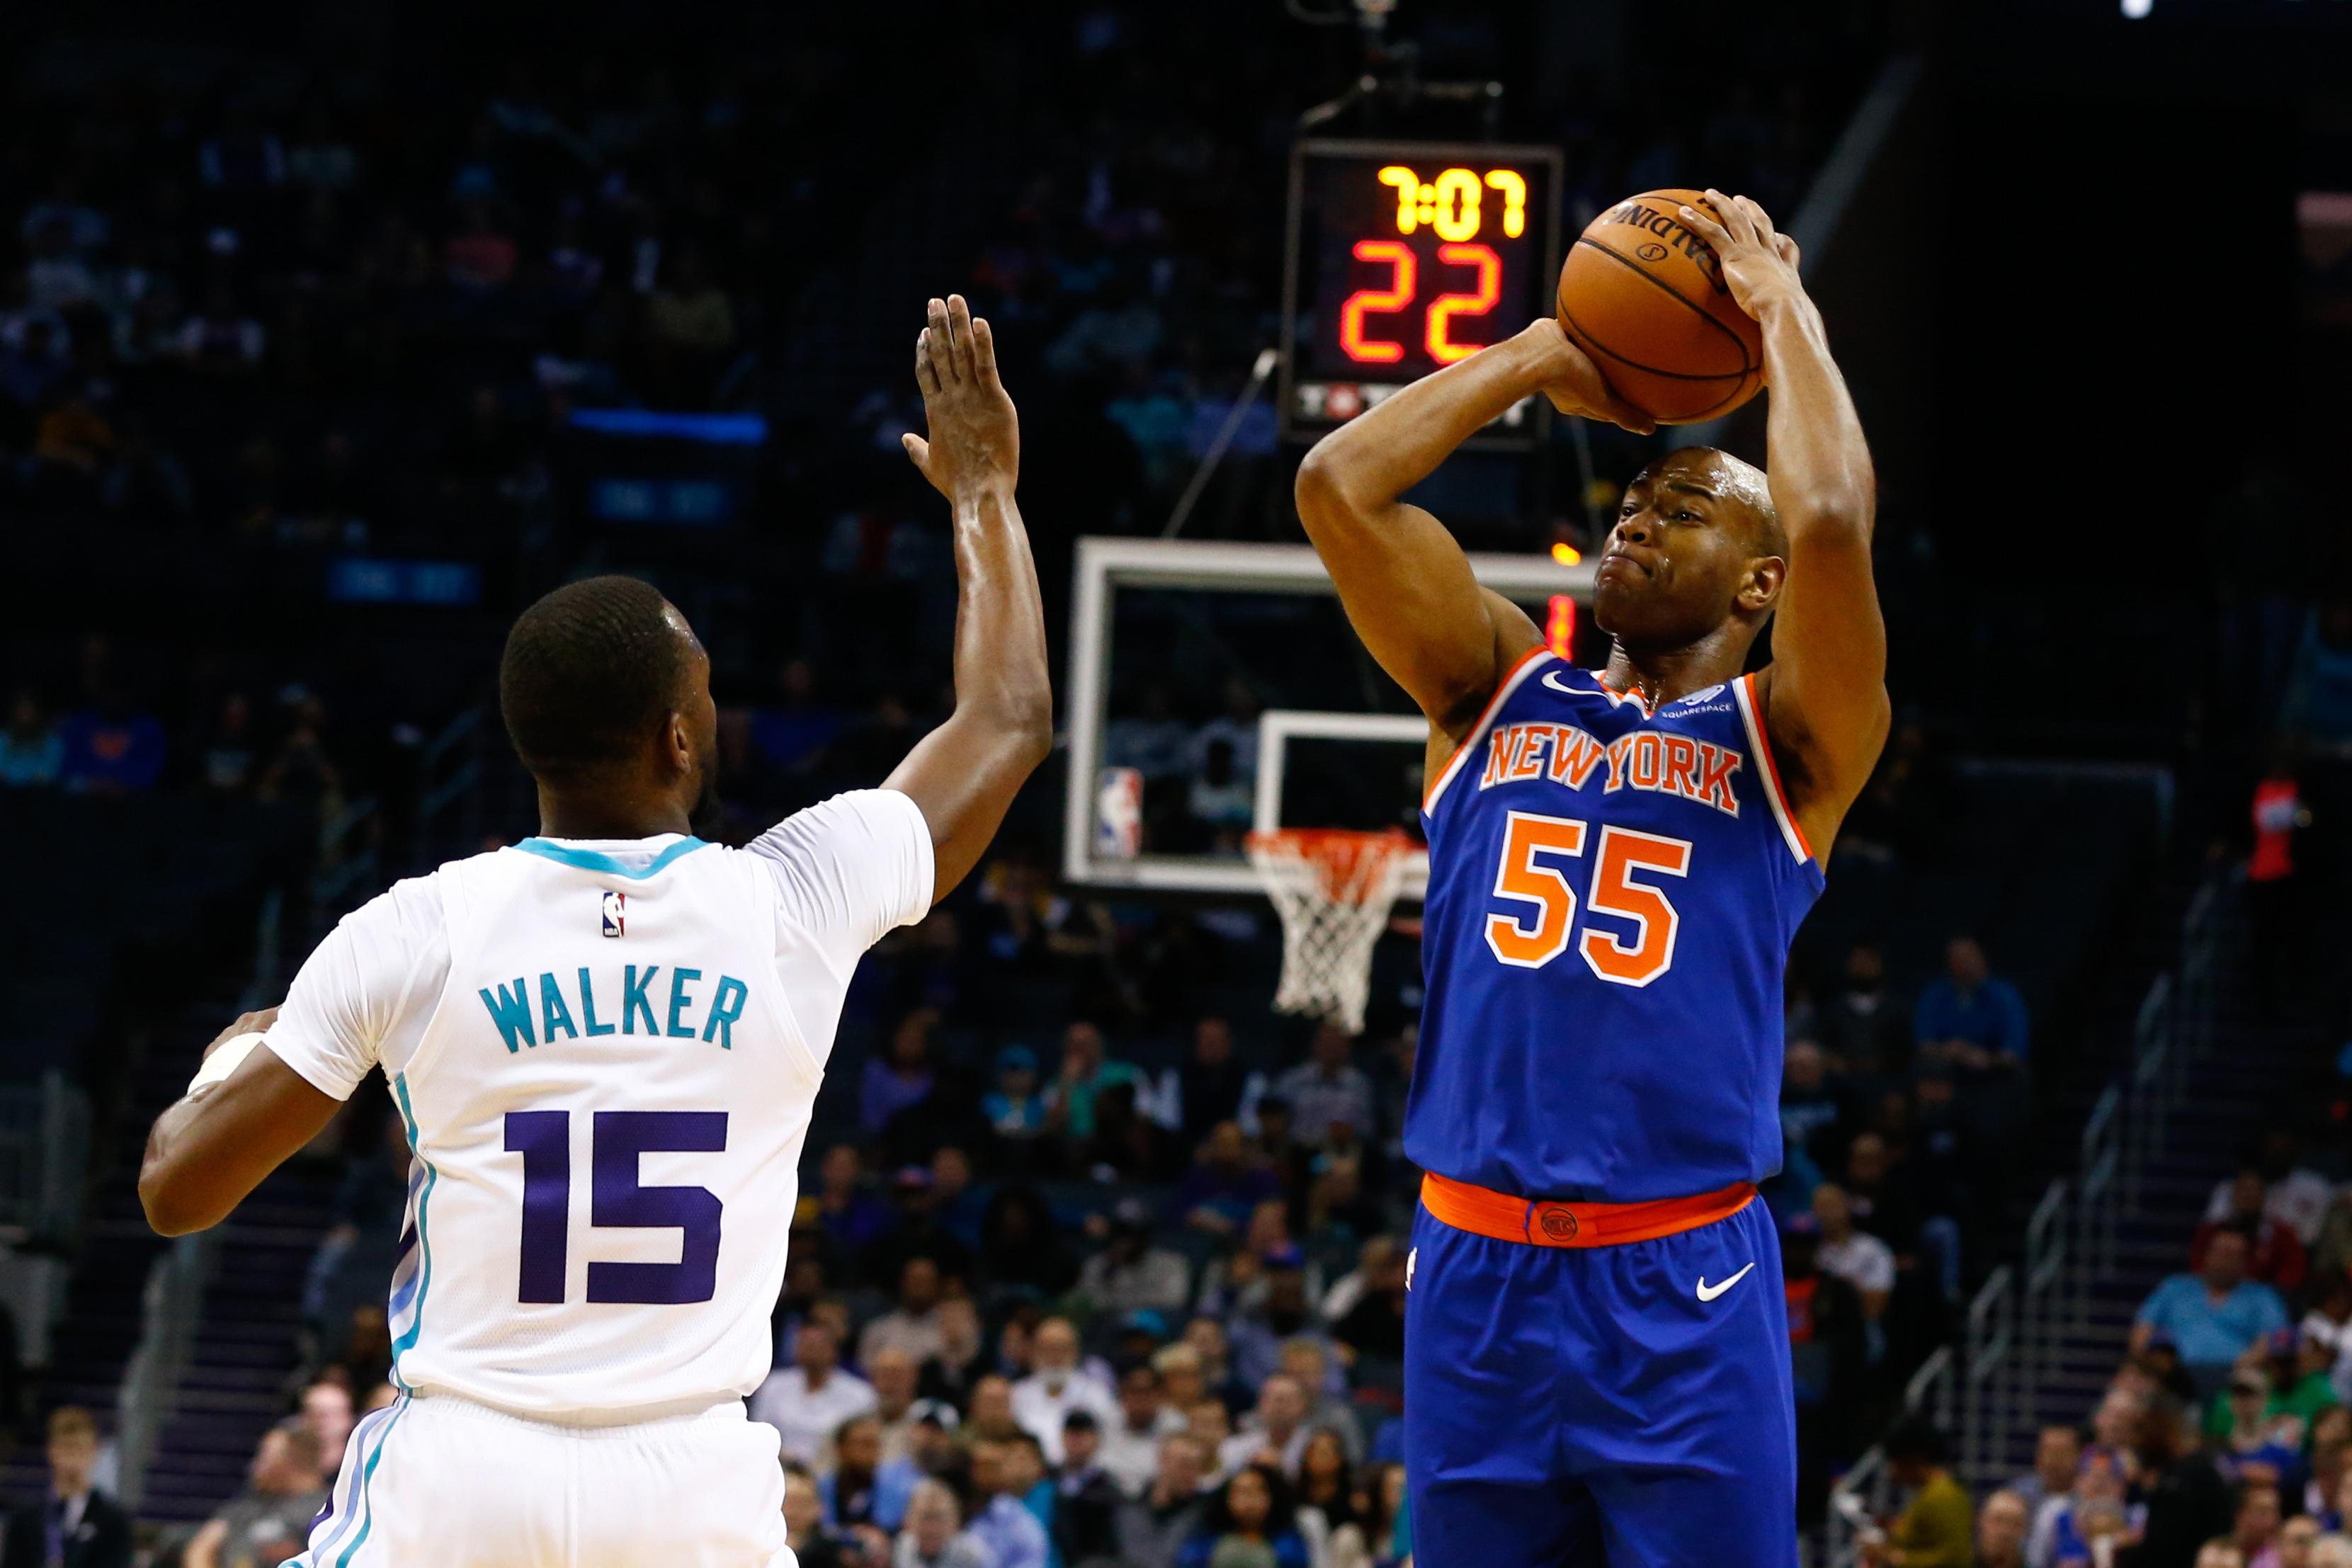 Report: Knicks to guarantee Jarrett Jack's contract for rest of season